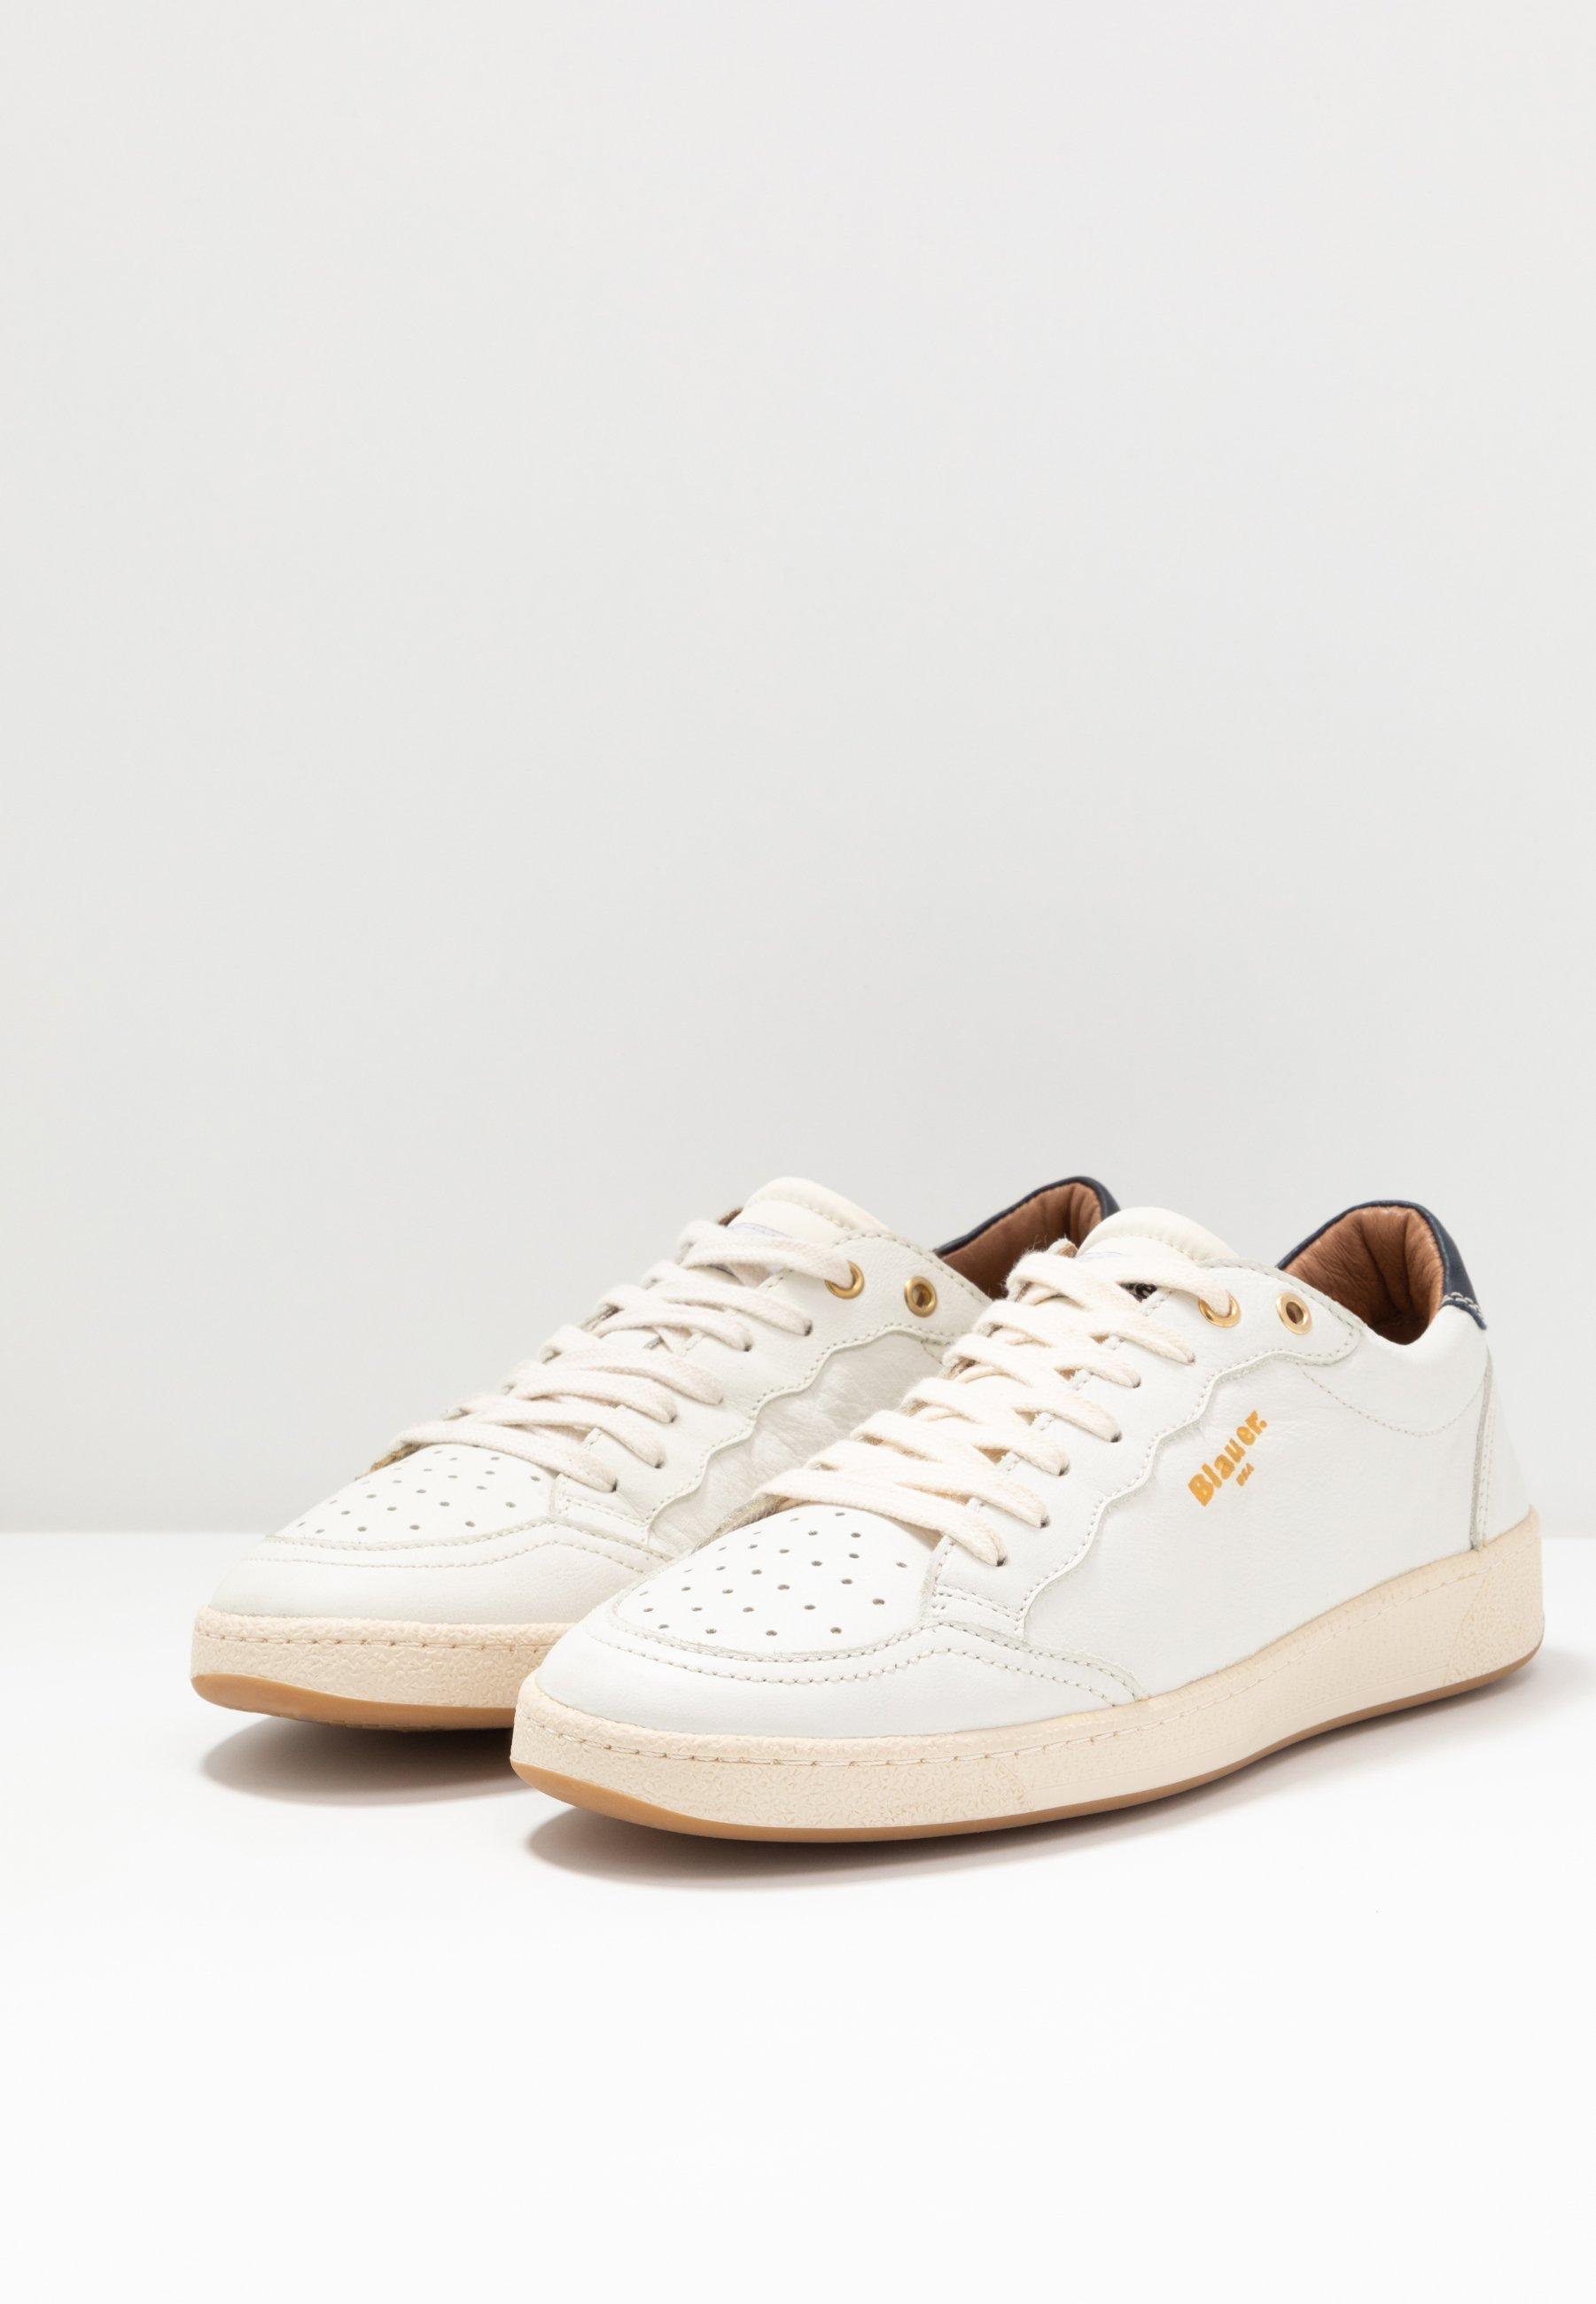 Blauer MURRAY - Sneaker low - white/weiß - Herrenschuhe lY3v8